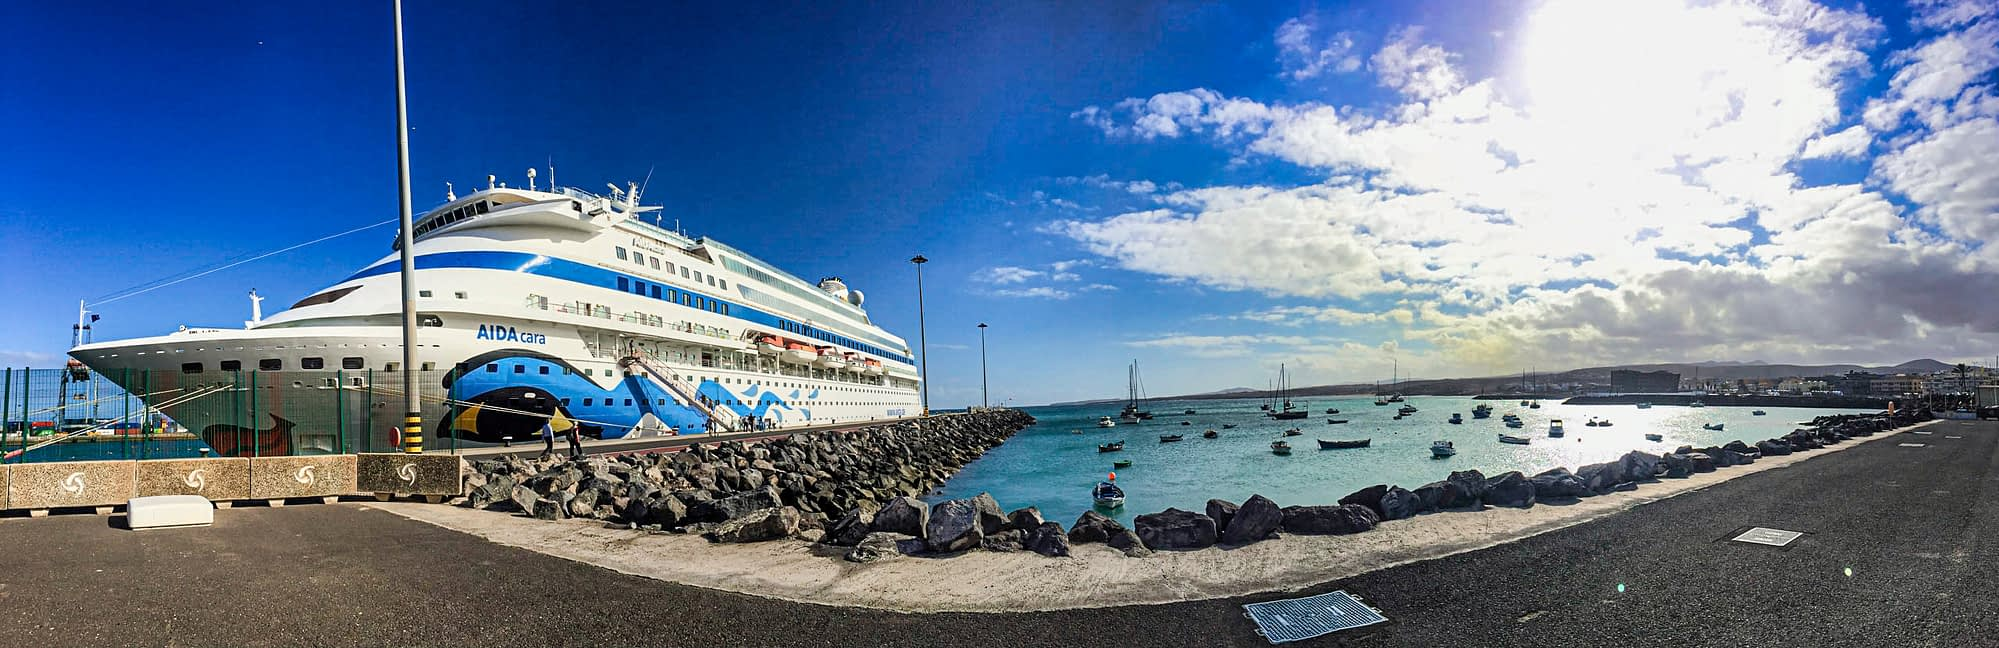 Arrecife, Canary Islands